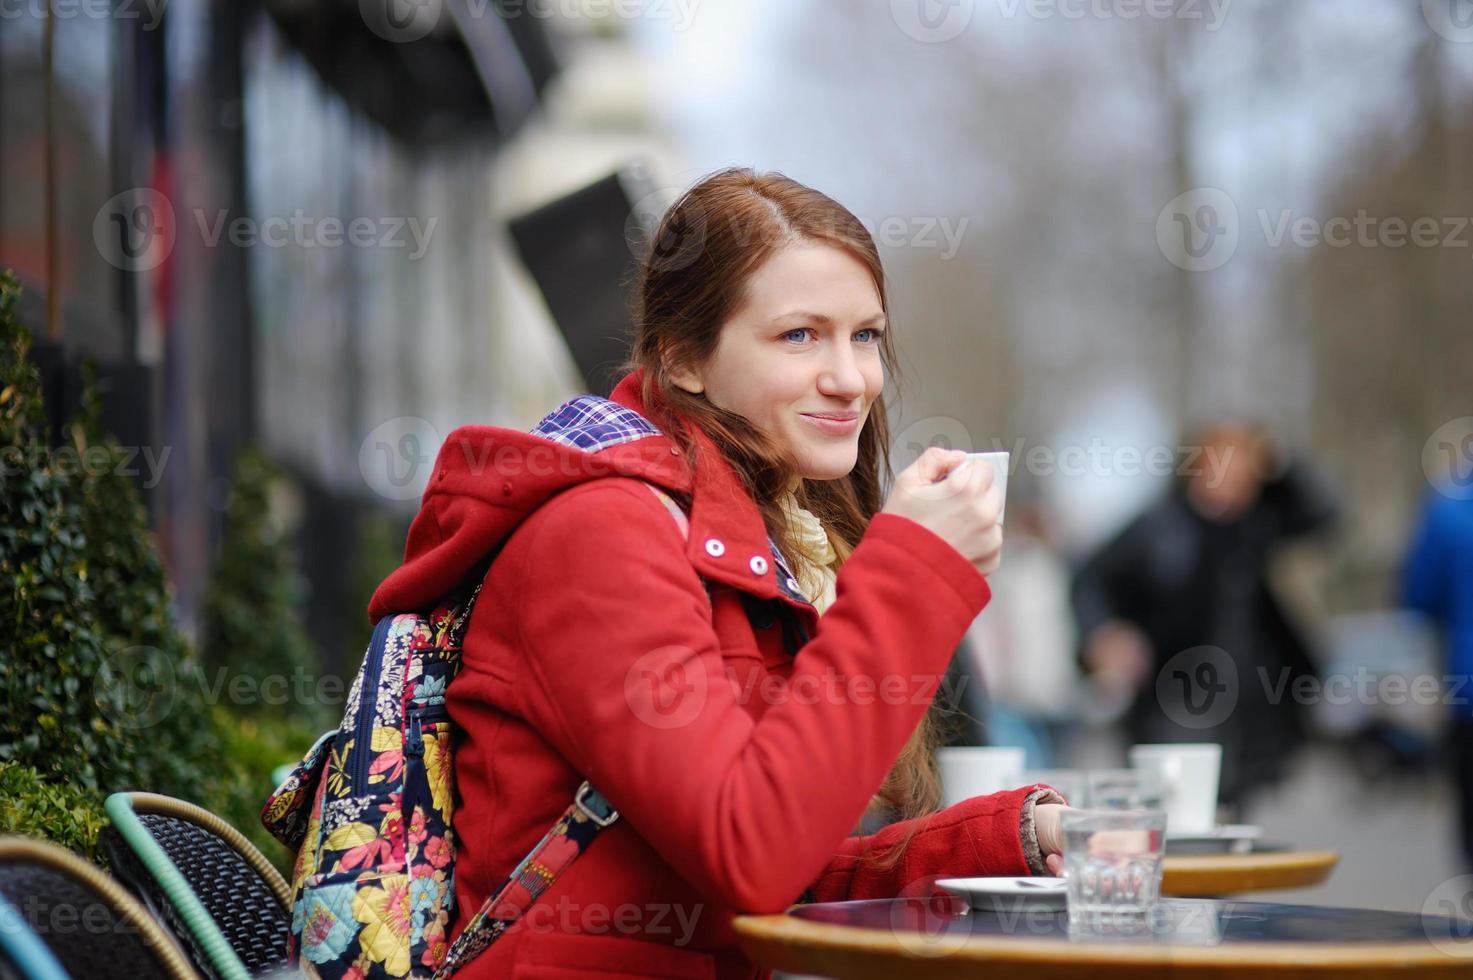 giovane donna che beve caffè foto